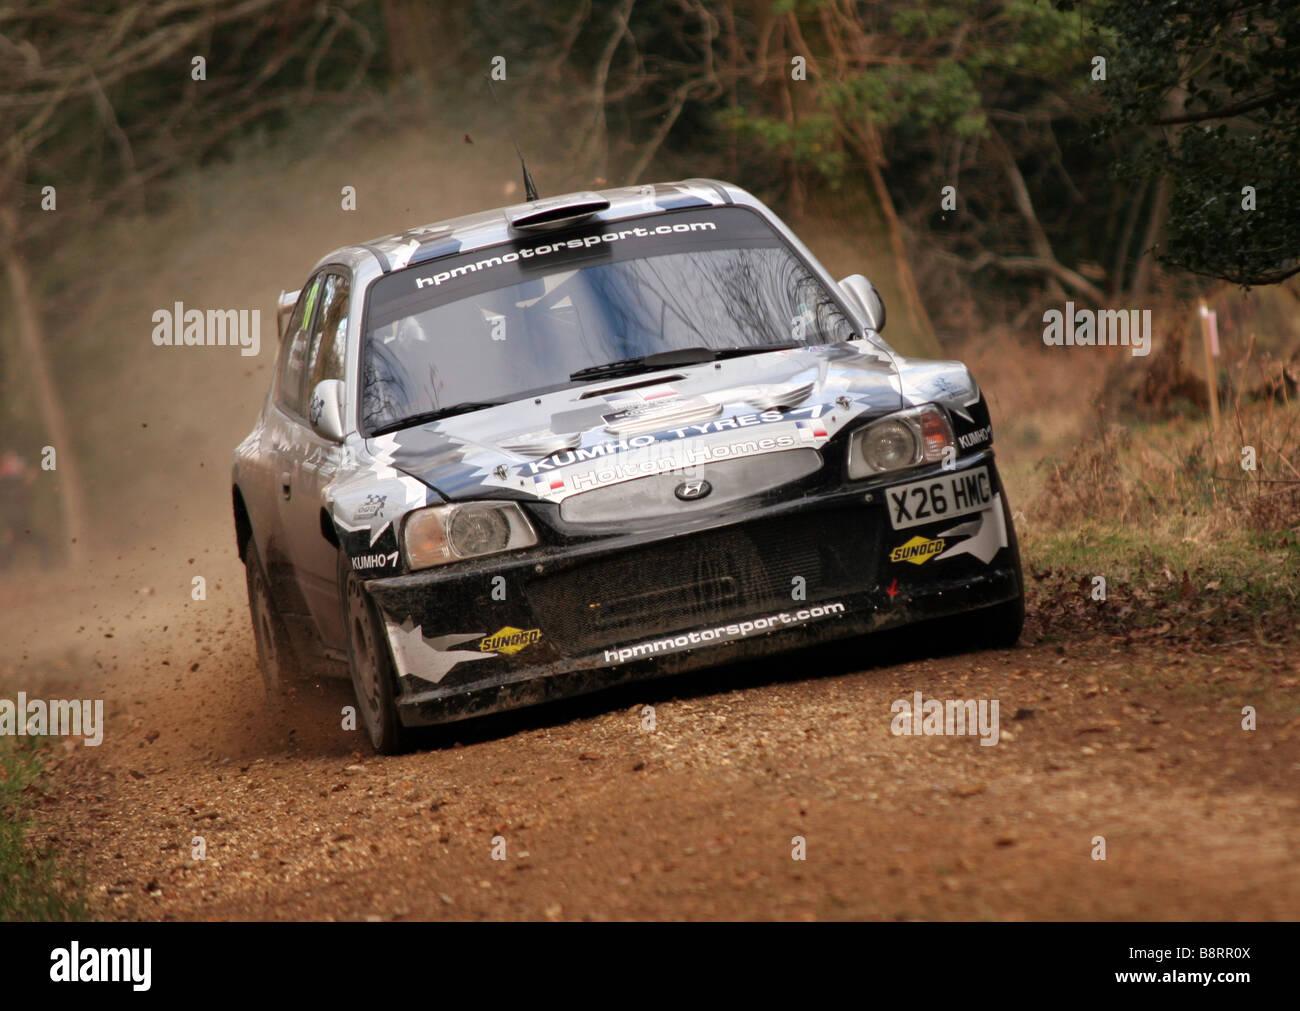 Hyundai Accent Rally Car Speed Stock Photos Hyundai Accent Rally